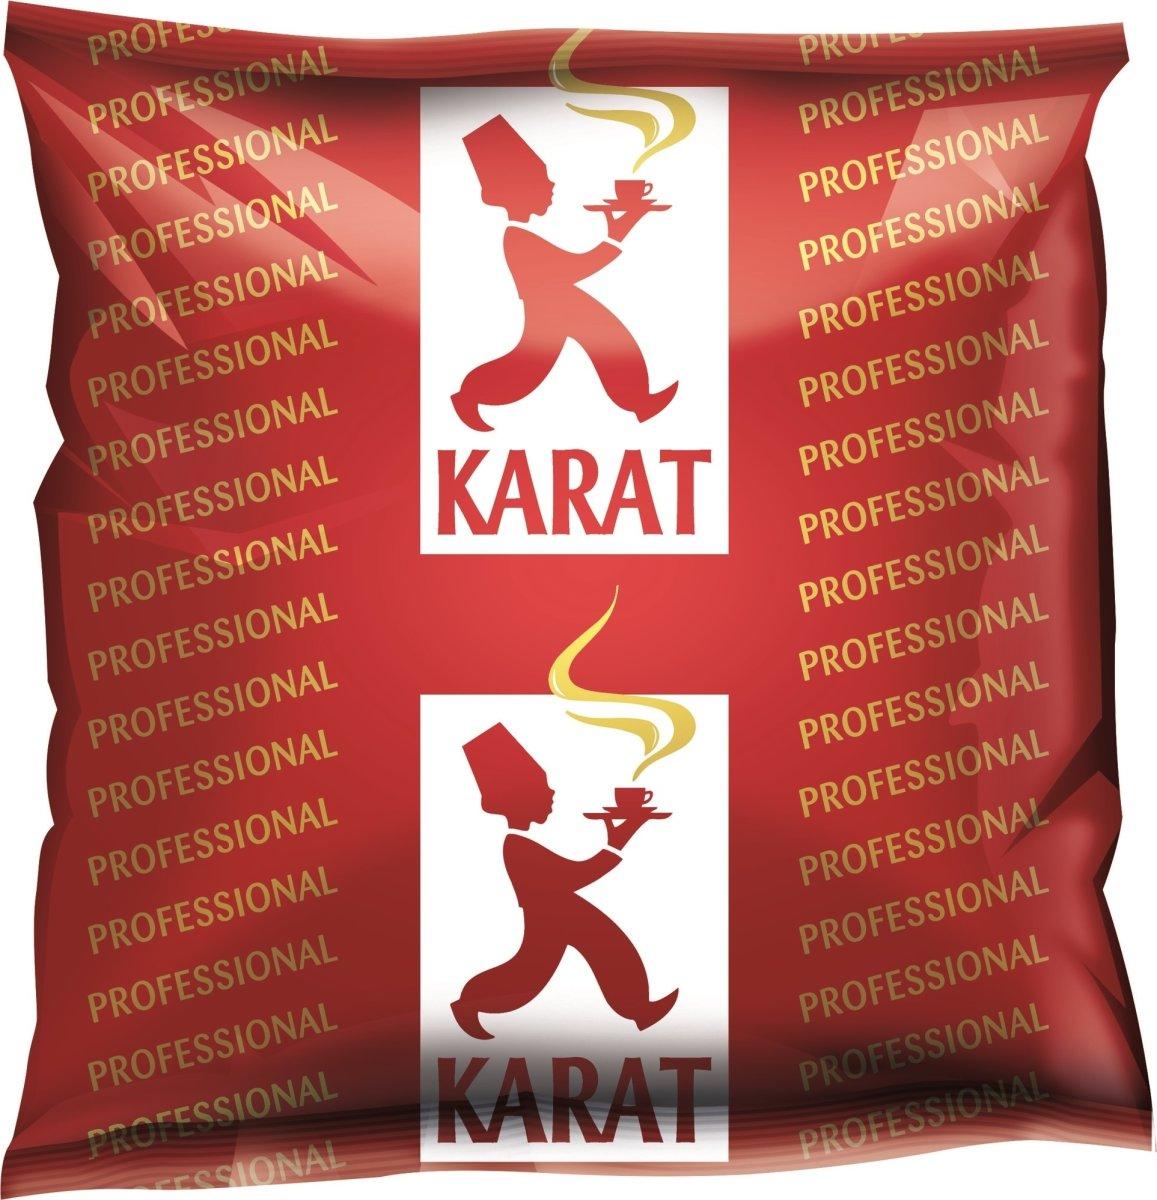 Karat Professionel Plantage kaffe, 500g